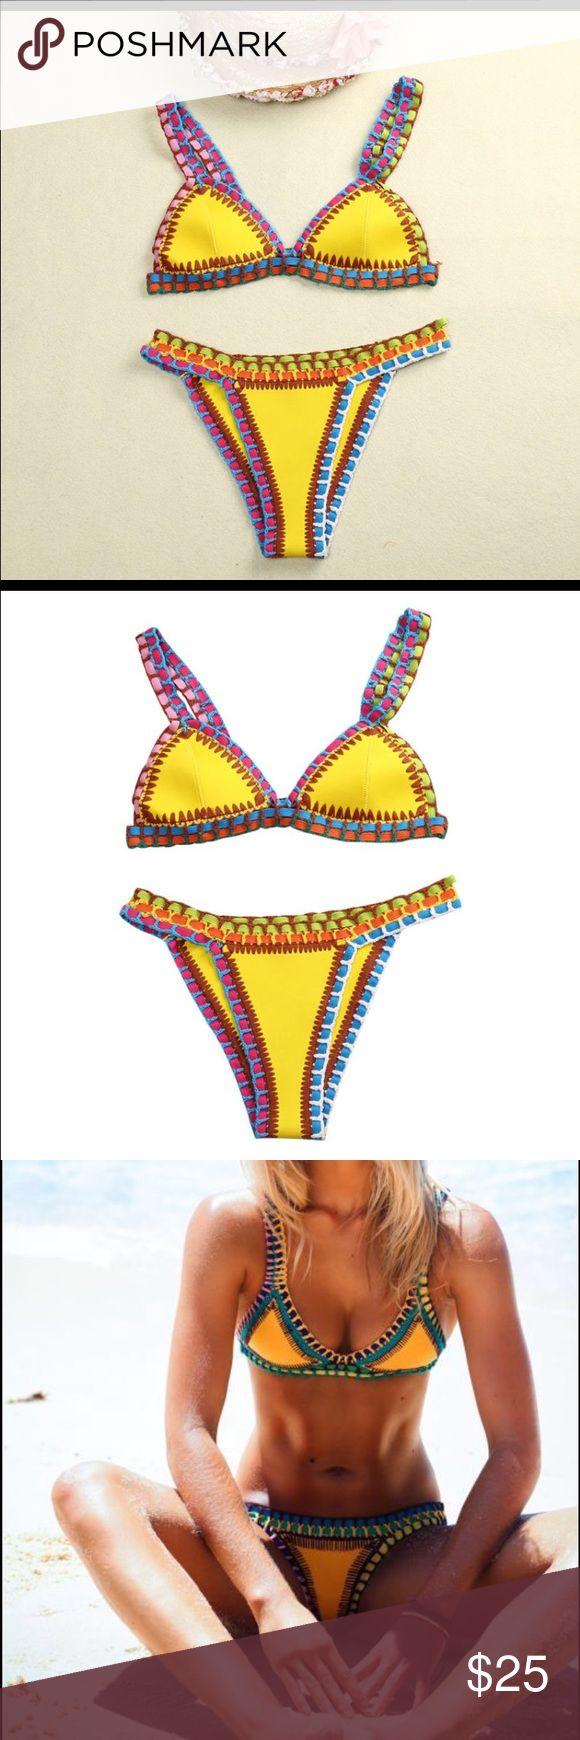 Yellow bikini set Yellow stitched bikini set. Never worn bought too small. Super cute. Not free people just tagged for exposure. Free People Swim Bikinis